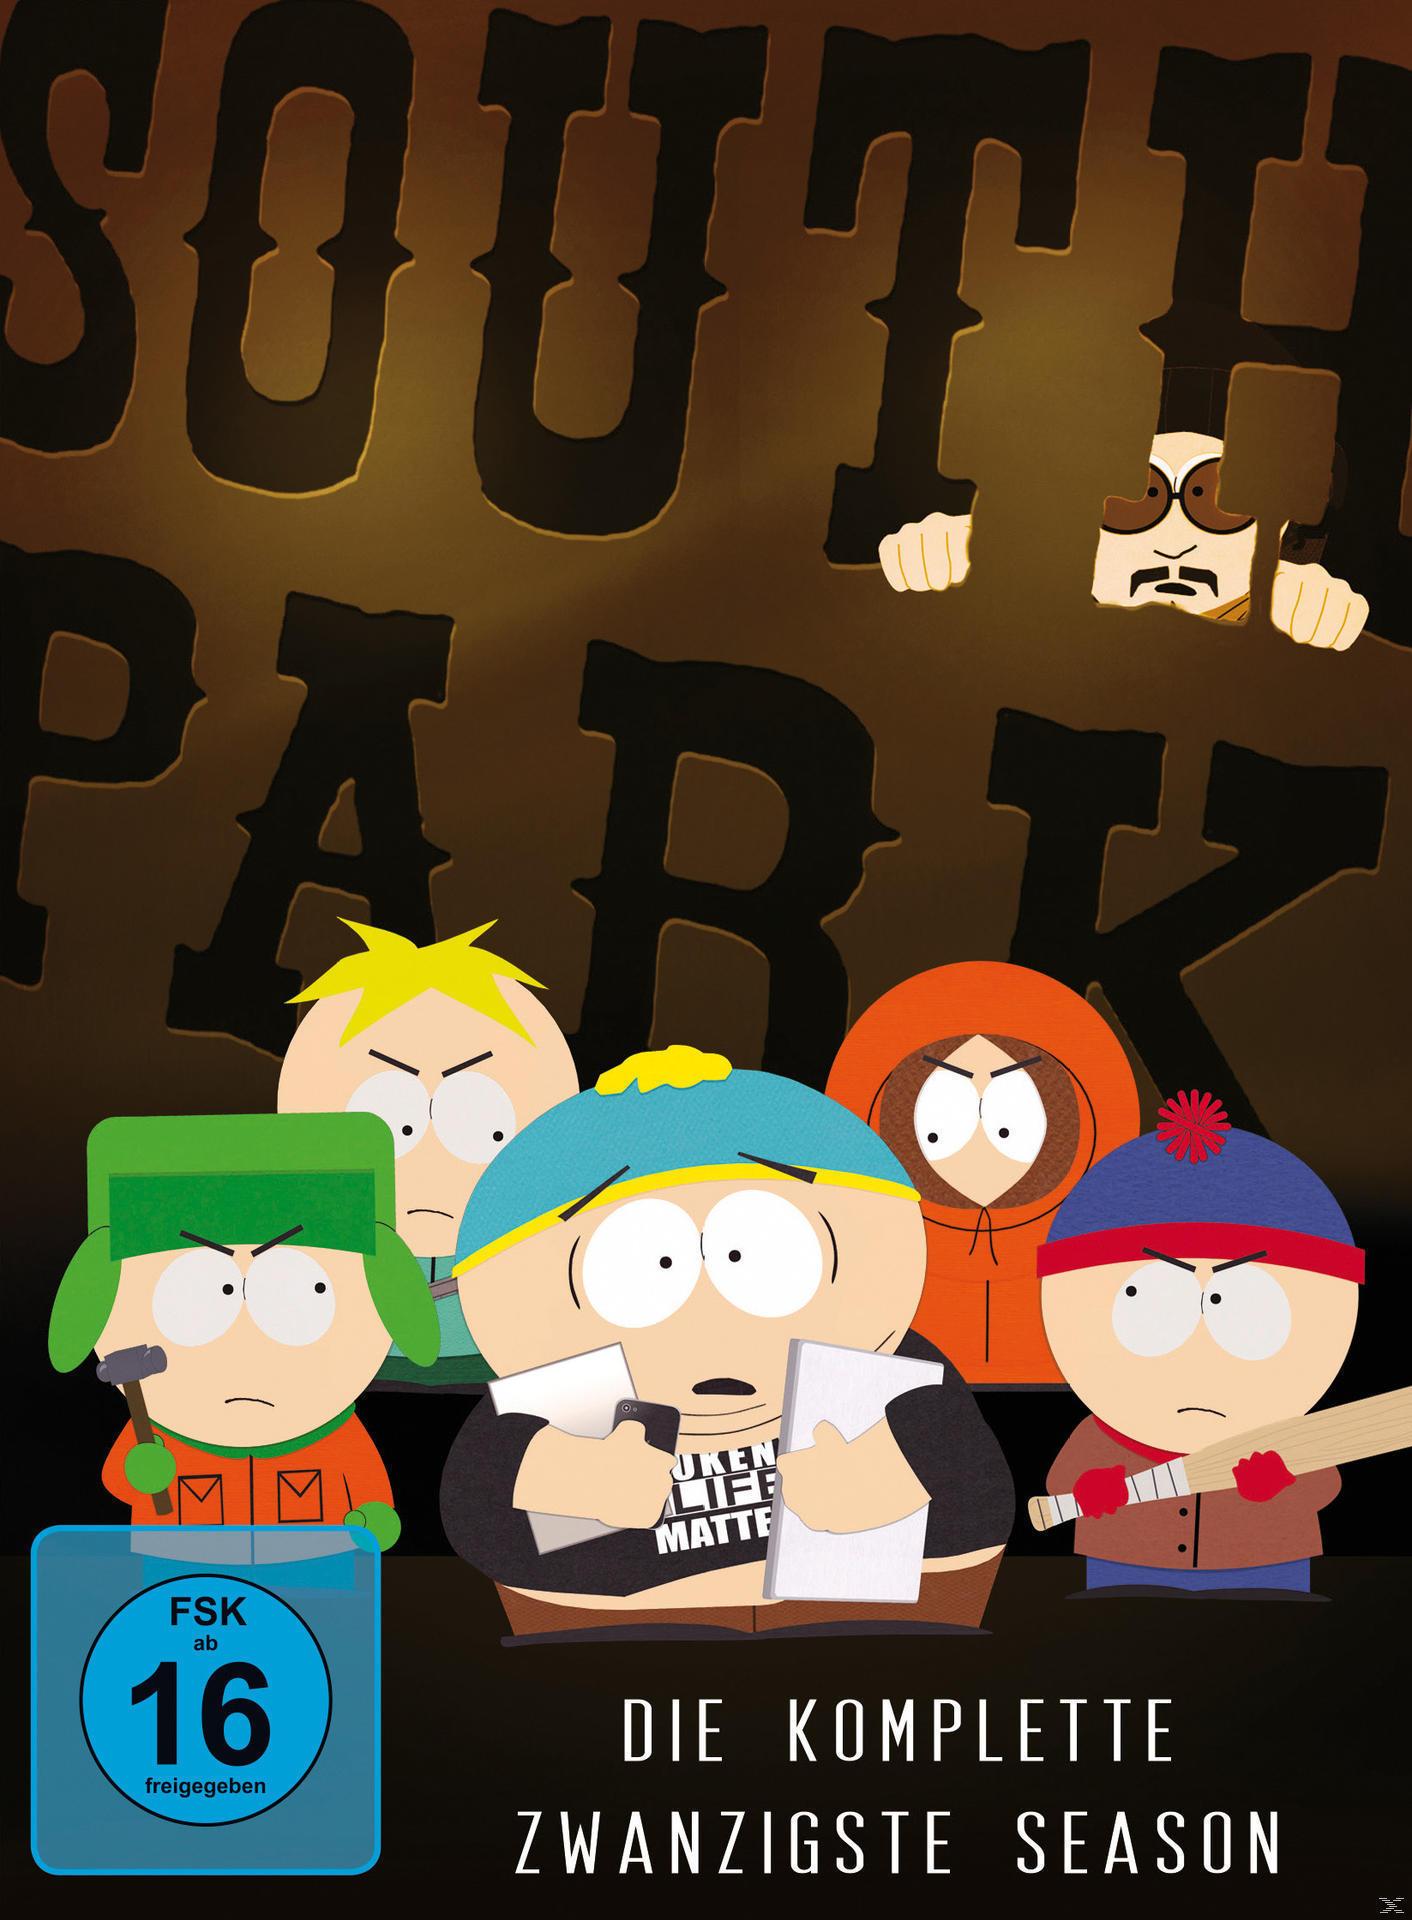 South Park - Season 20 - 2 Disc DVD (DVD) für 29,99 Euro